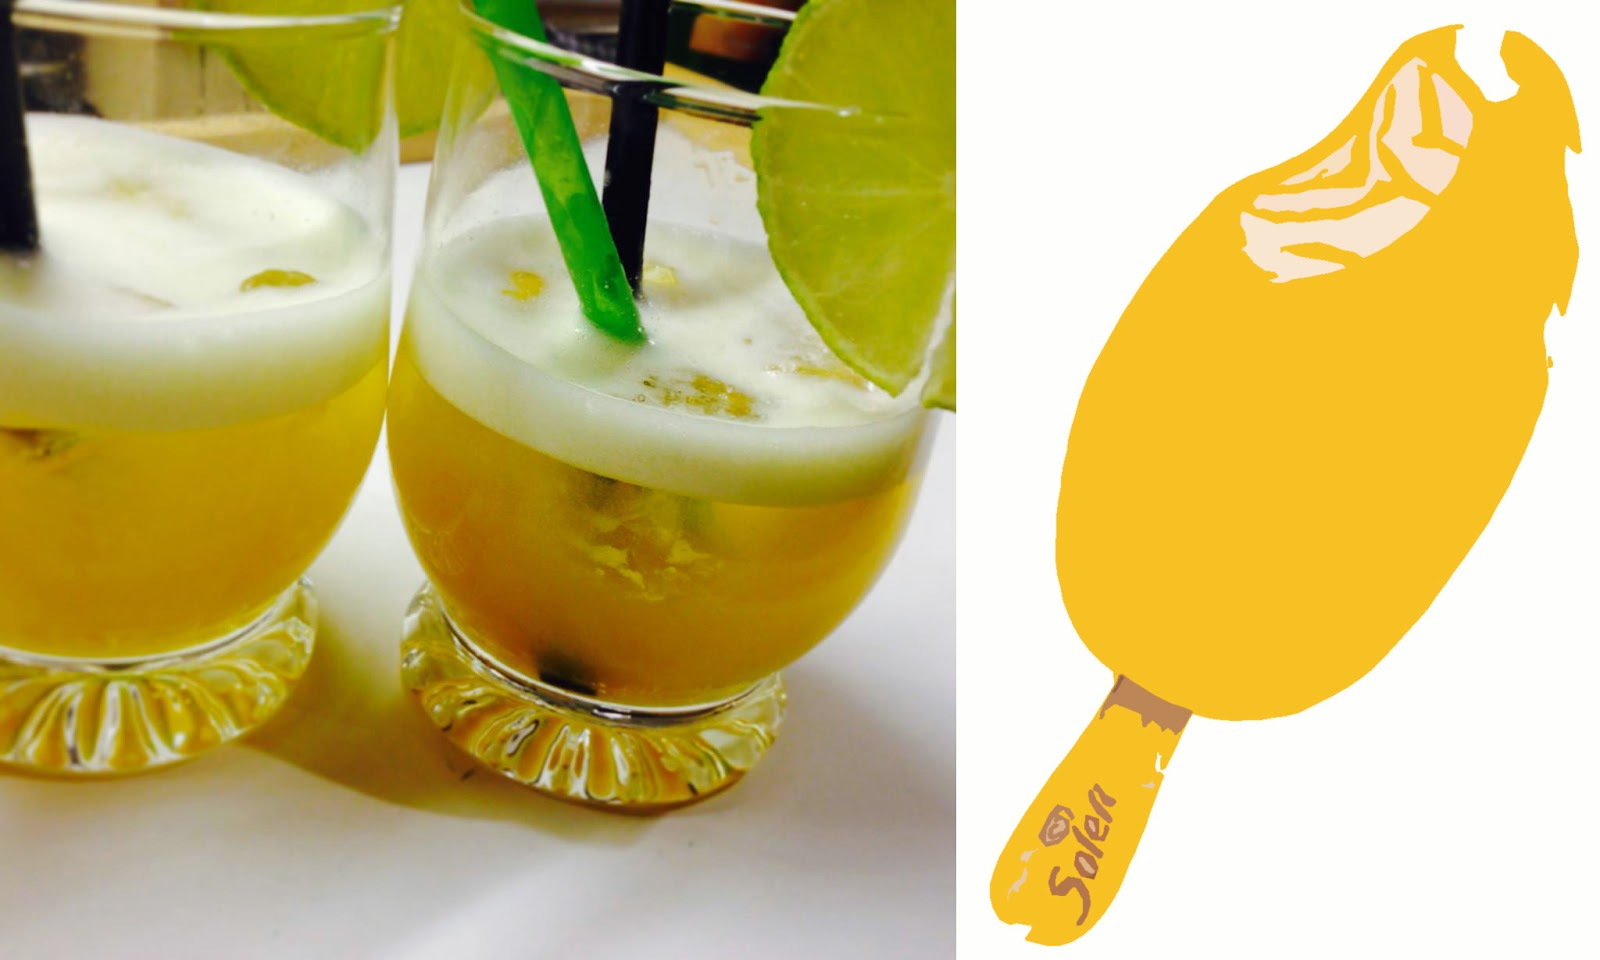 eb3d25d3c30 Solero-Kinder-Cocktail (schmeckt wie Solero Eis) – BackGAUDI